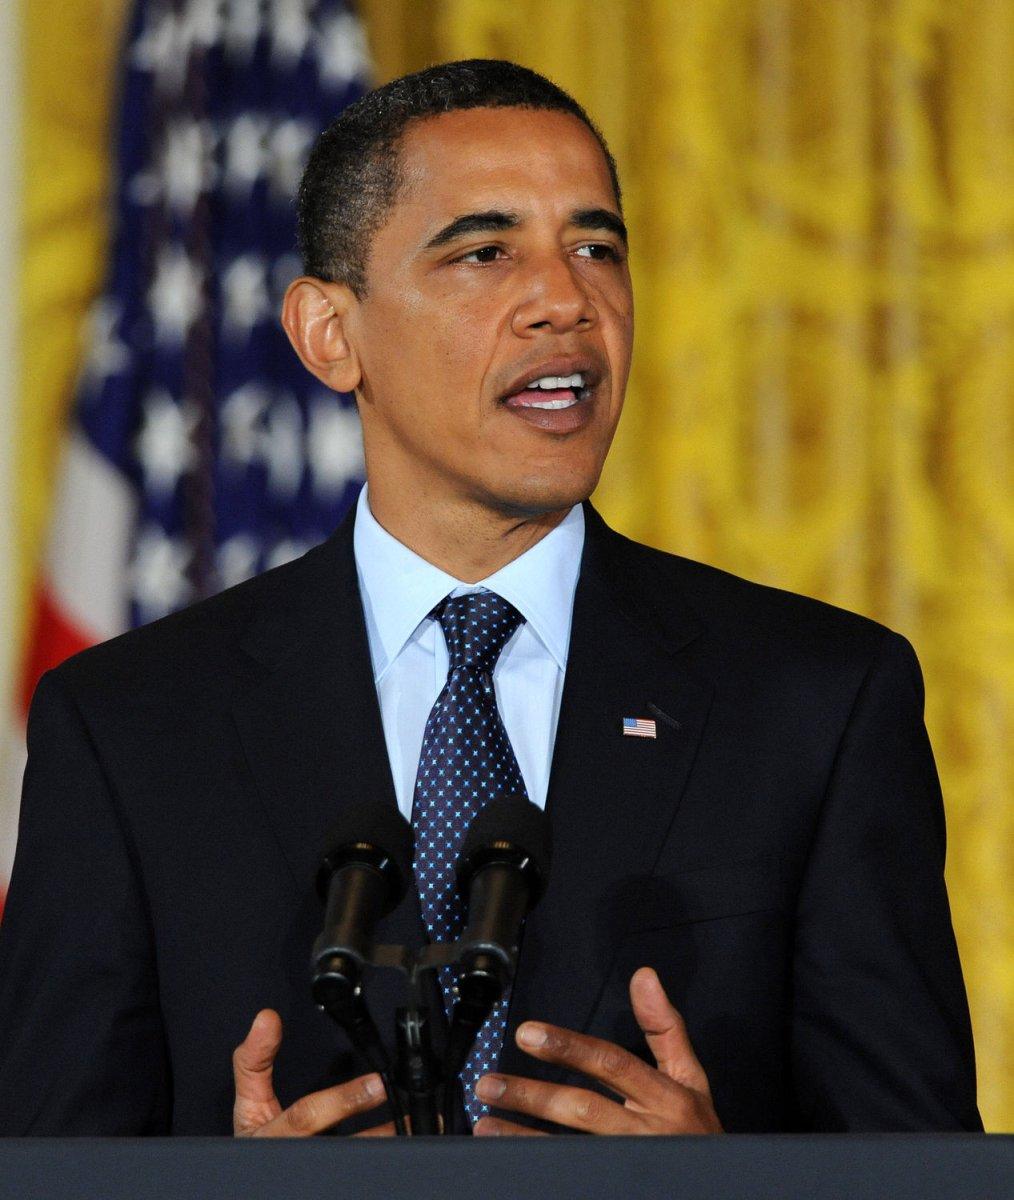 obamas national security braintrust - 675×800